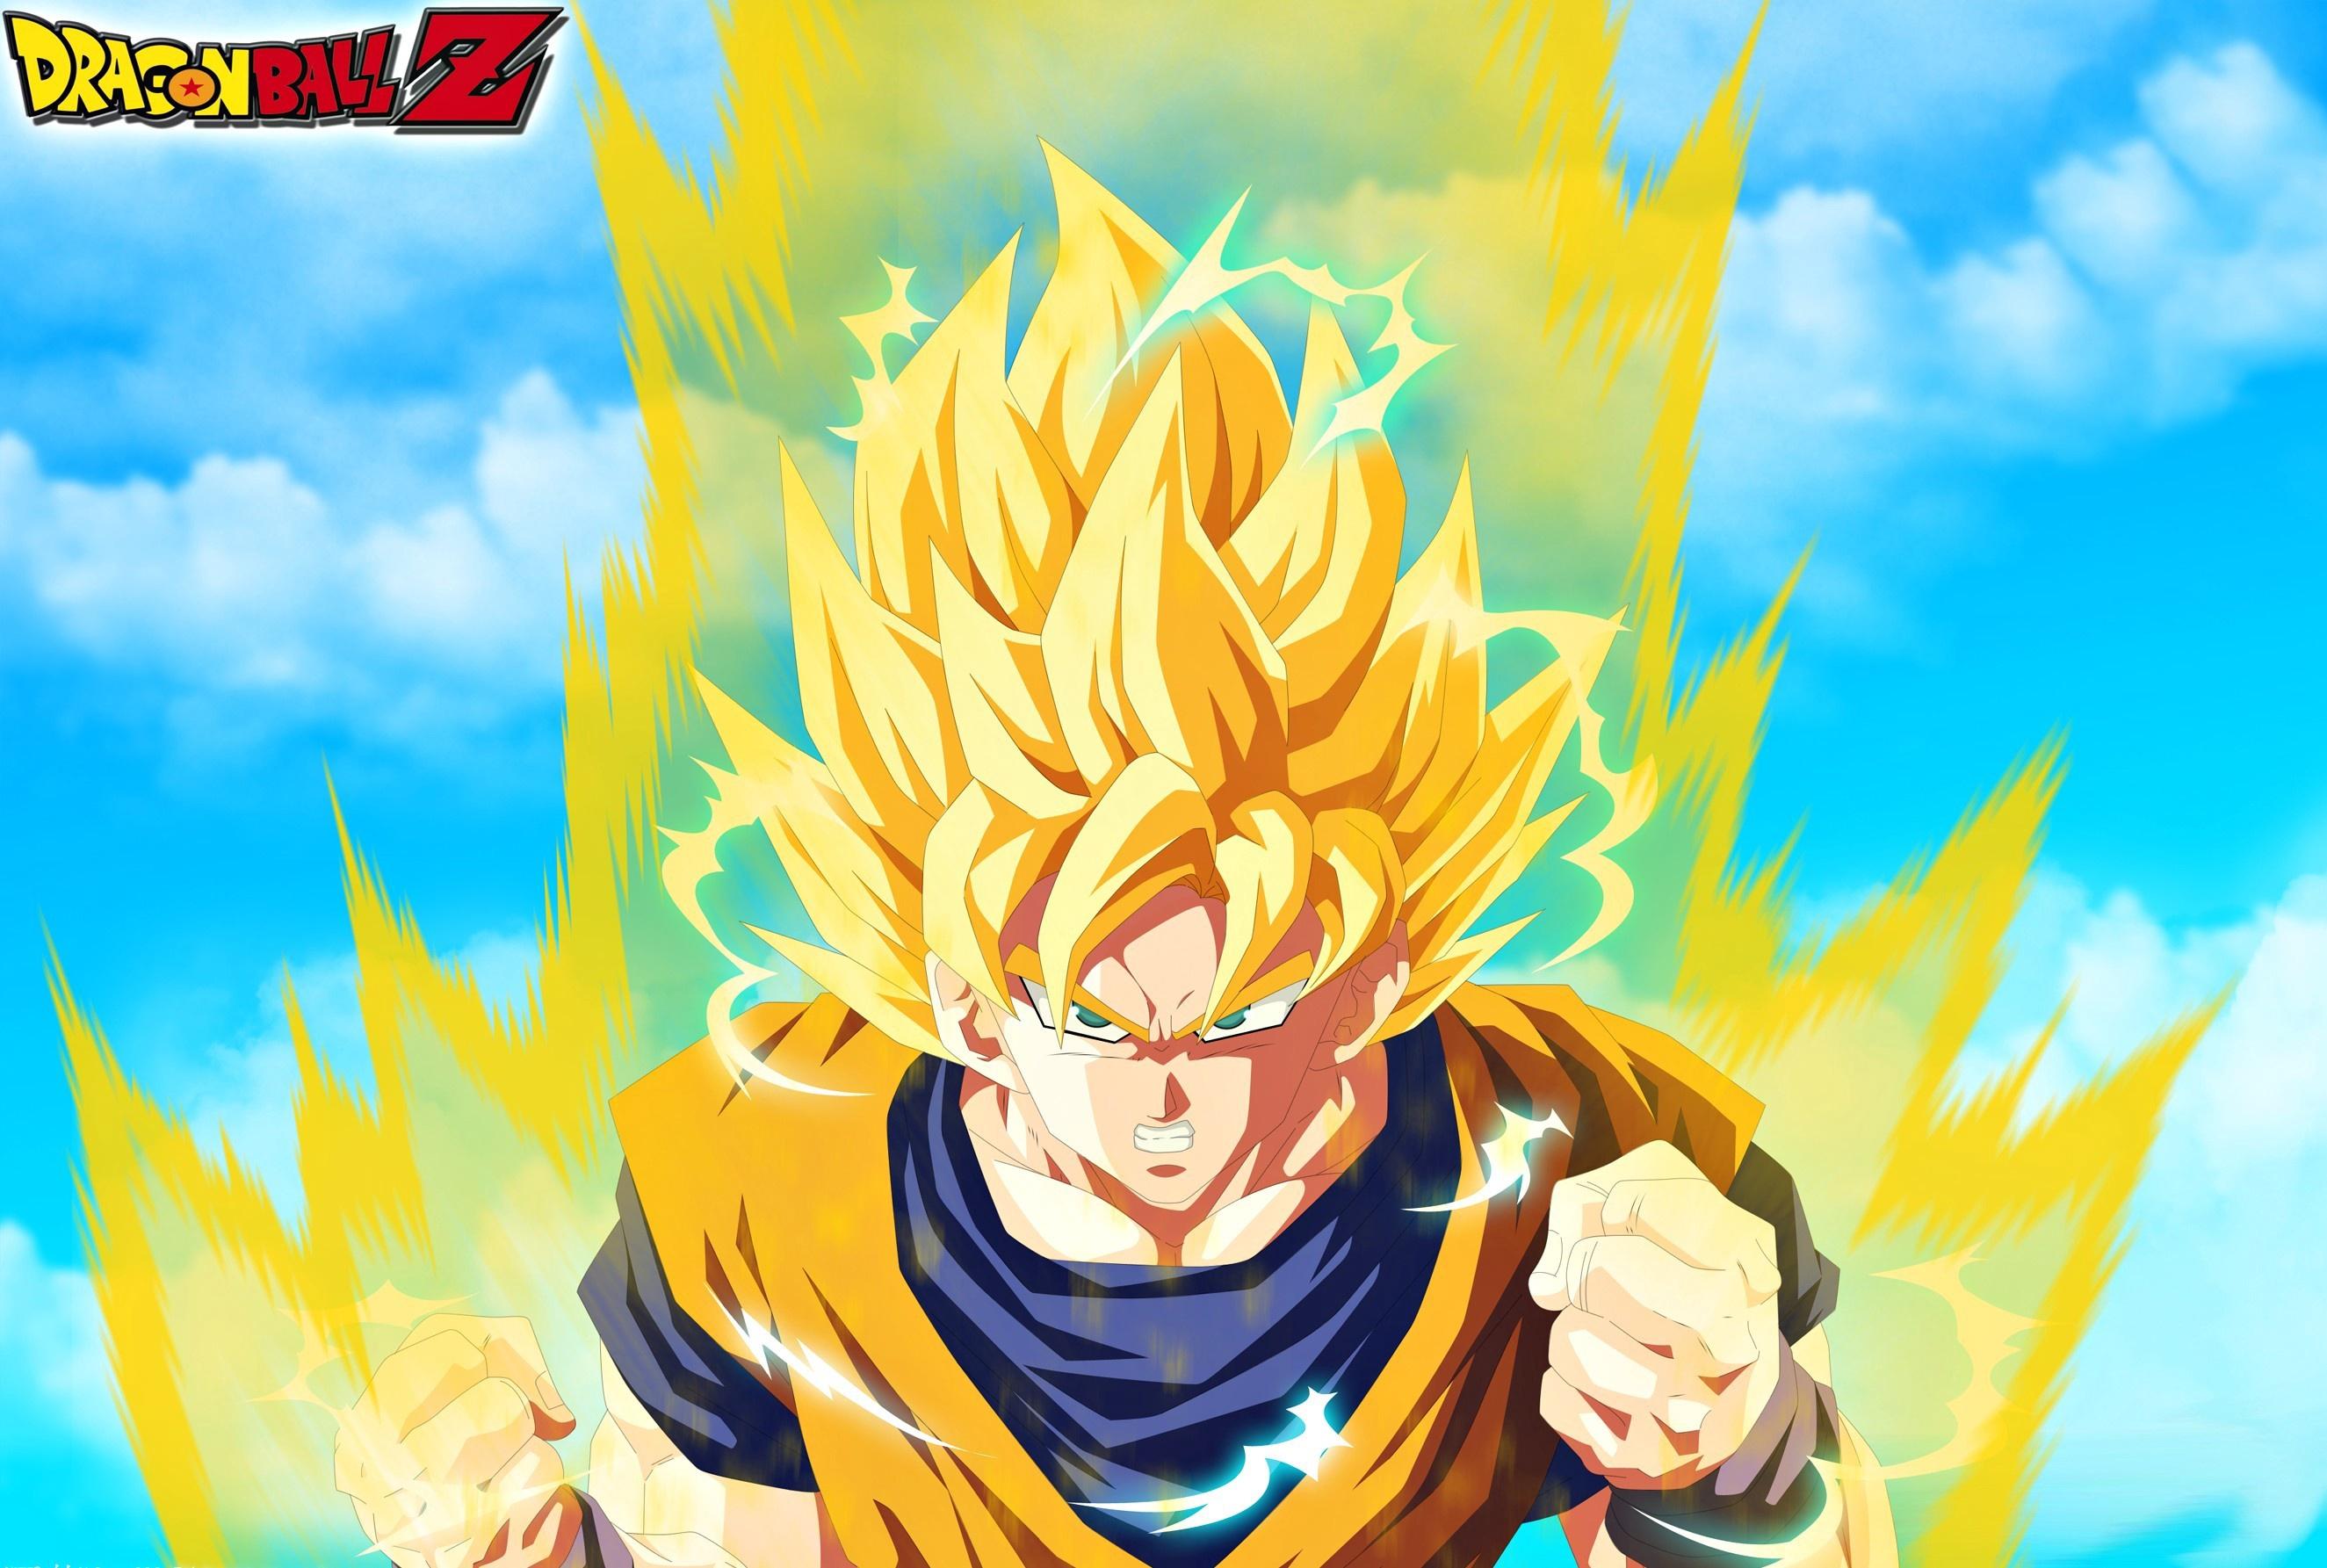 Wallpaper Dragon Ball Dragon Ball Z Son Goku Super Saiyan 2